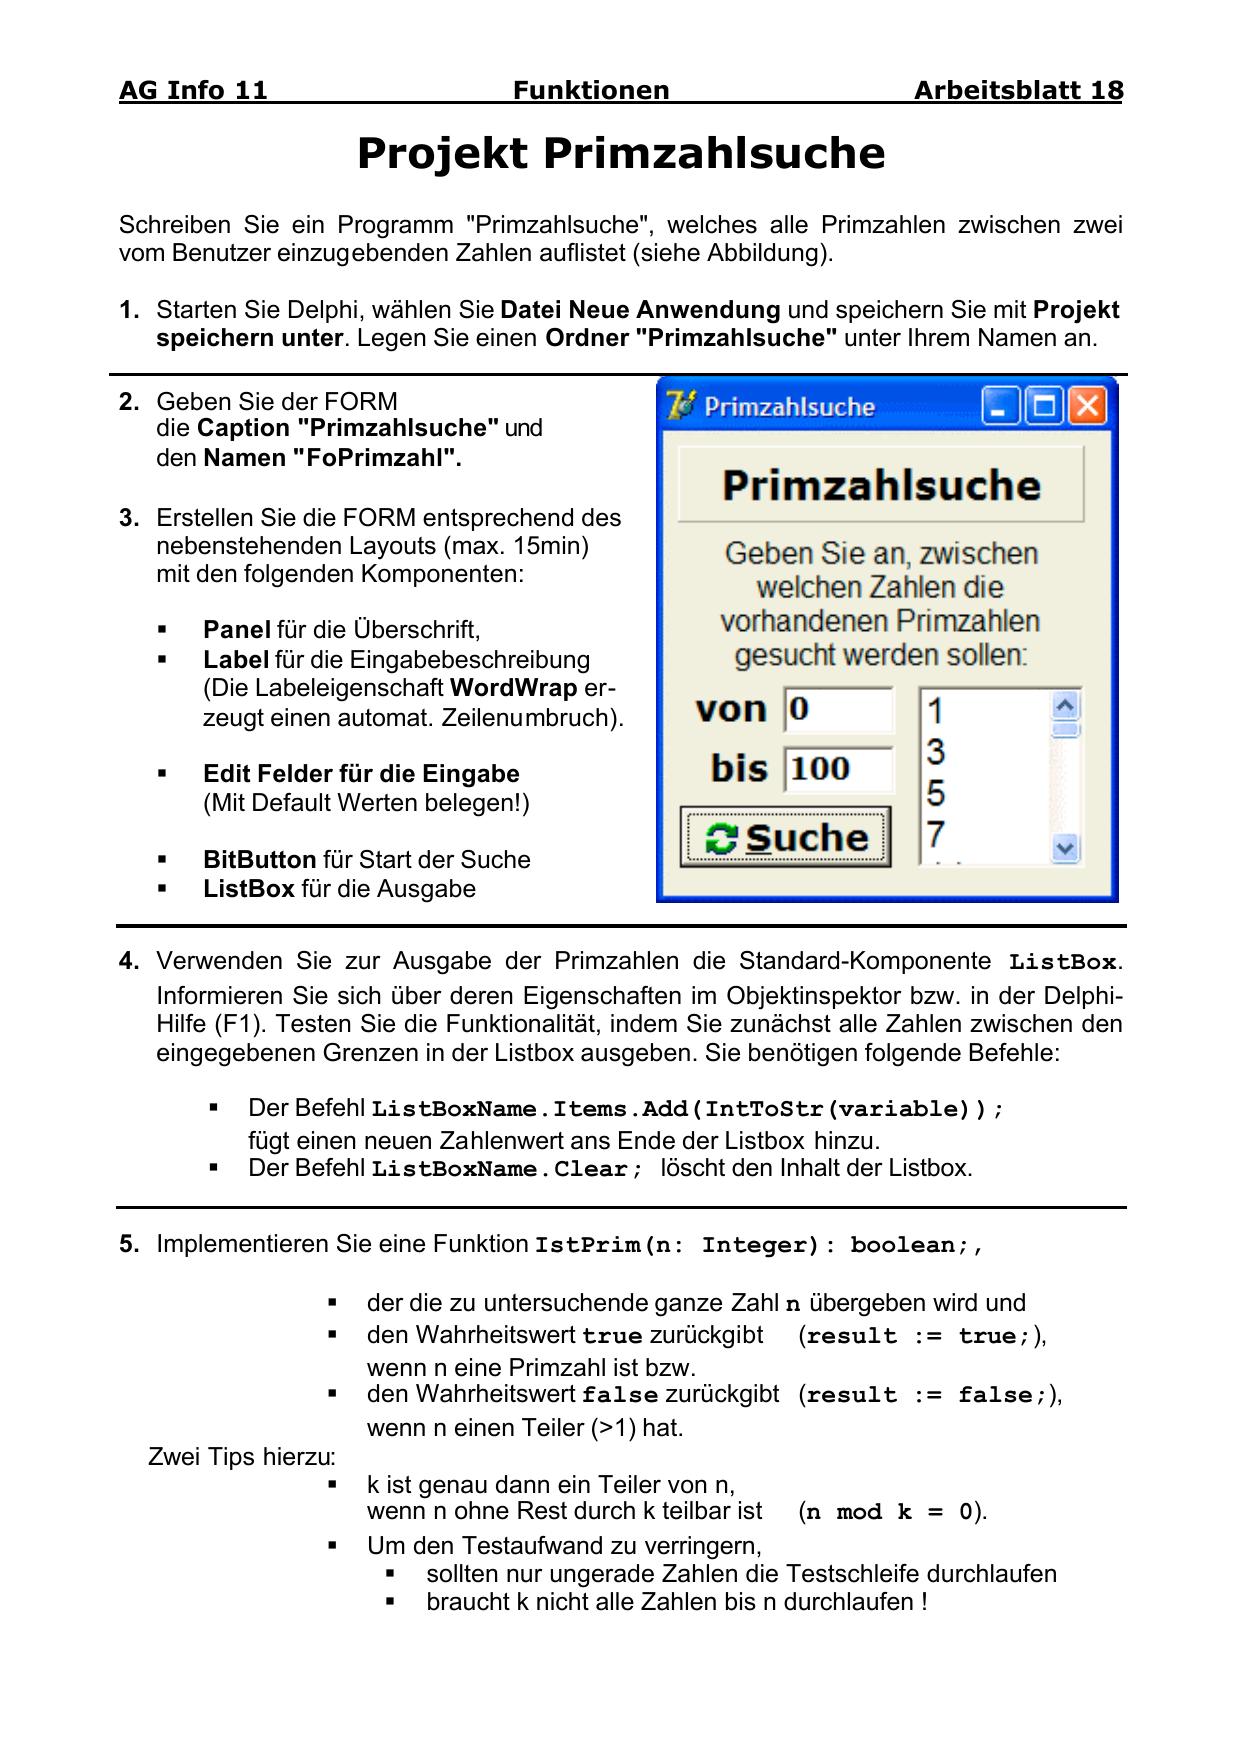 Tolle Größte Integer Funktion Arbeitsblatt Ideen - Super Lehrer ...